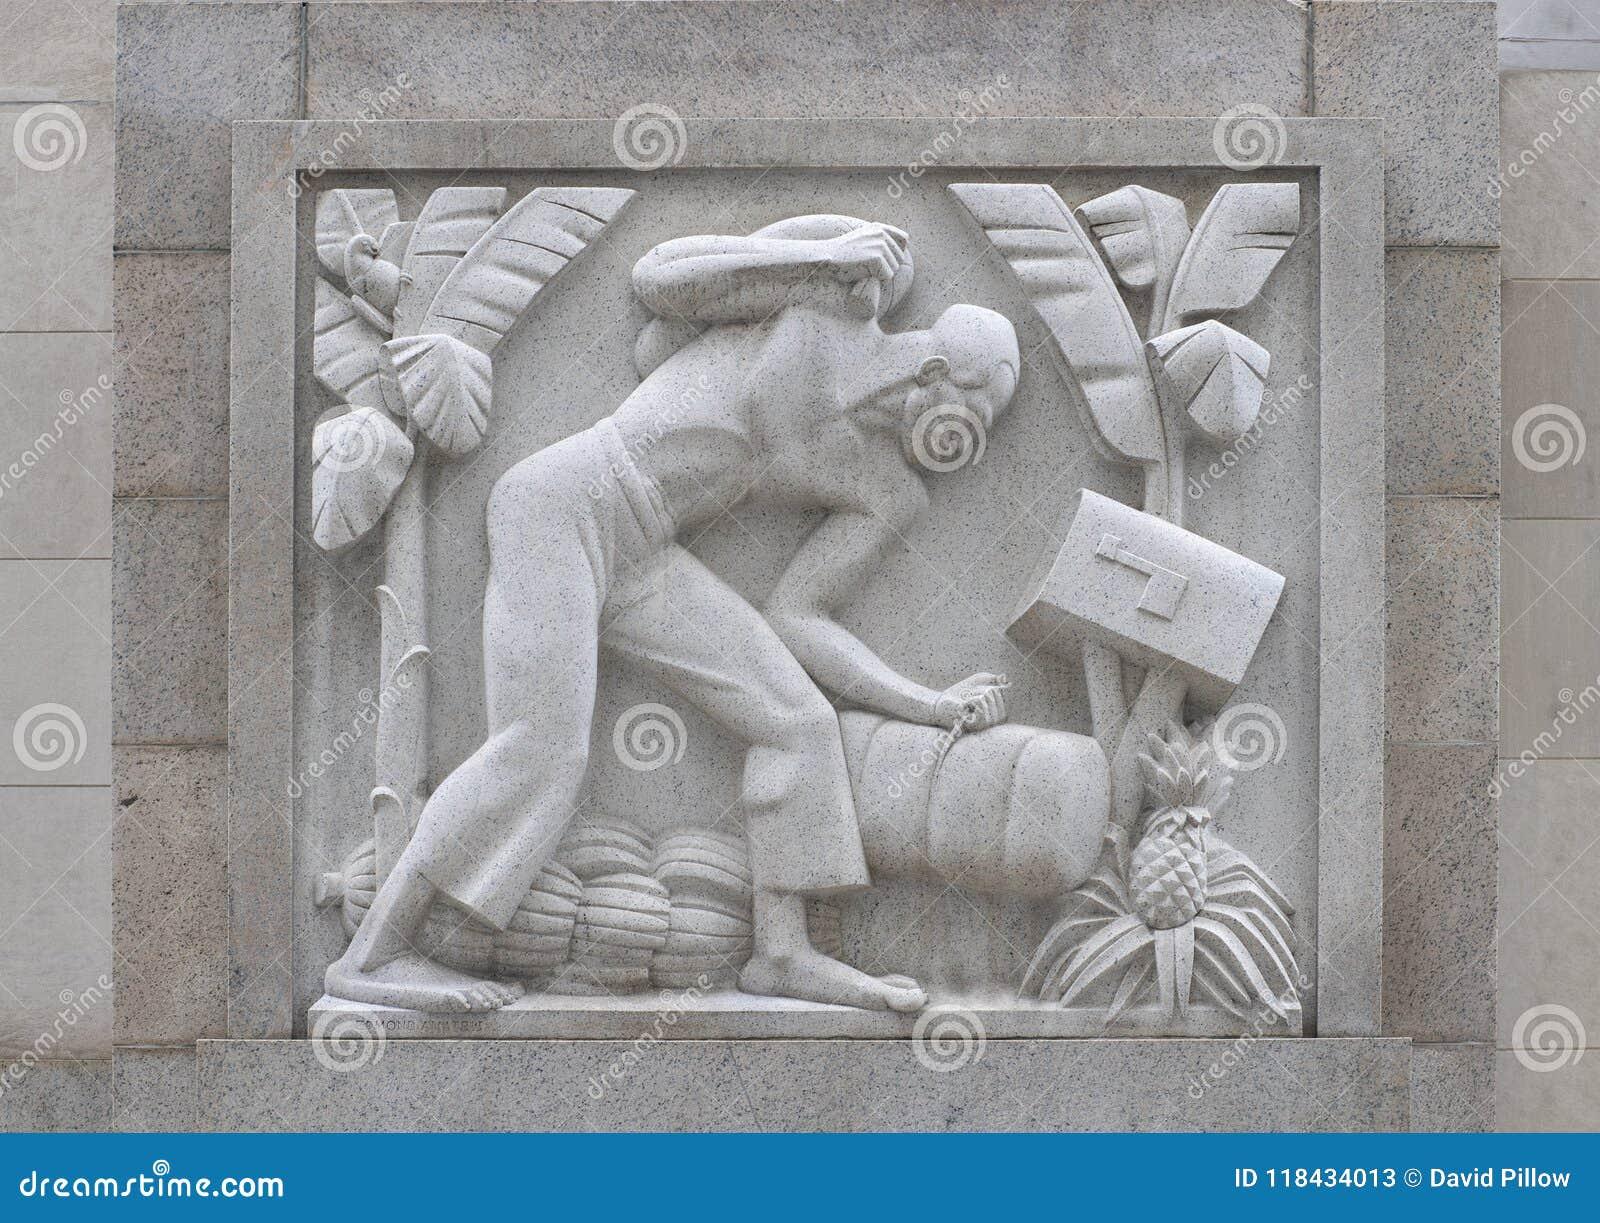 `-Cane Cutter ` av Edmond Amateis, Robert N C Säga nej till Sr Federal byggnad & stolpe - kontor